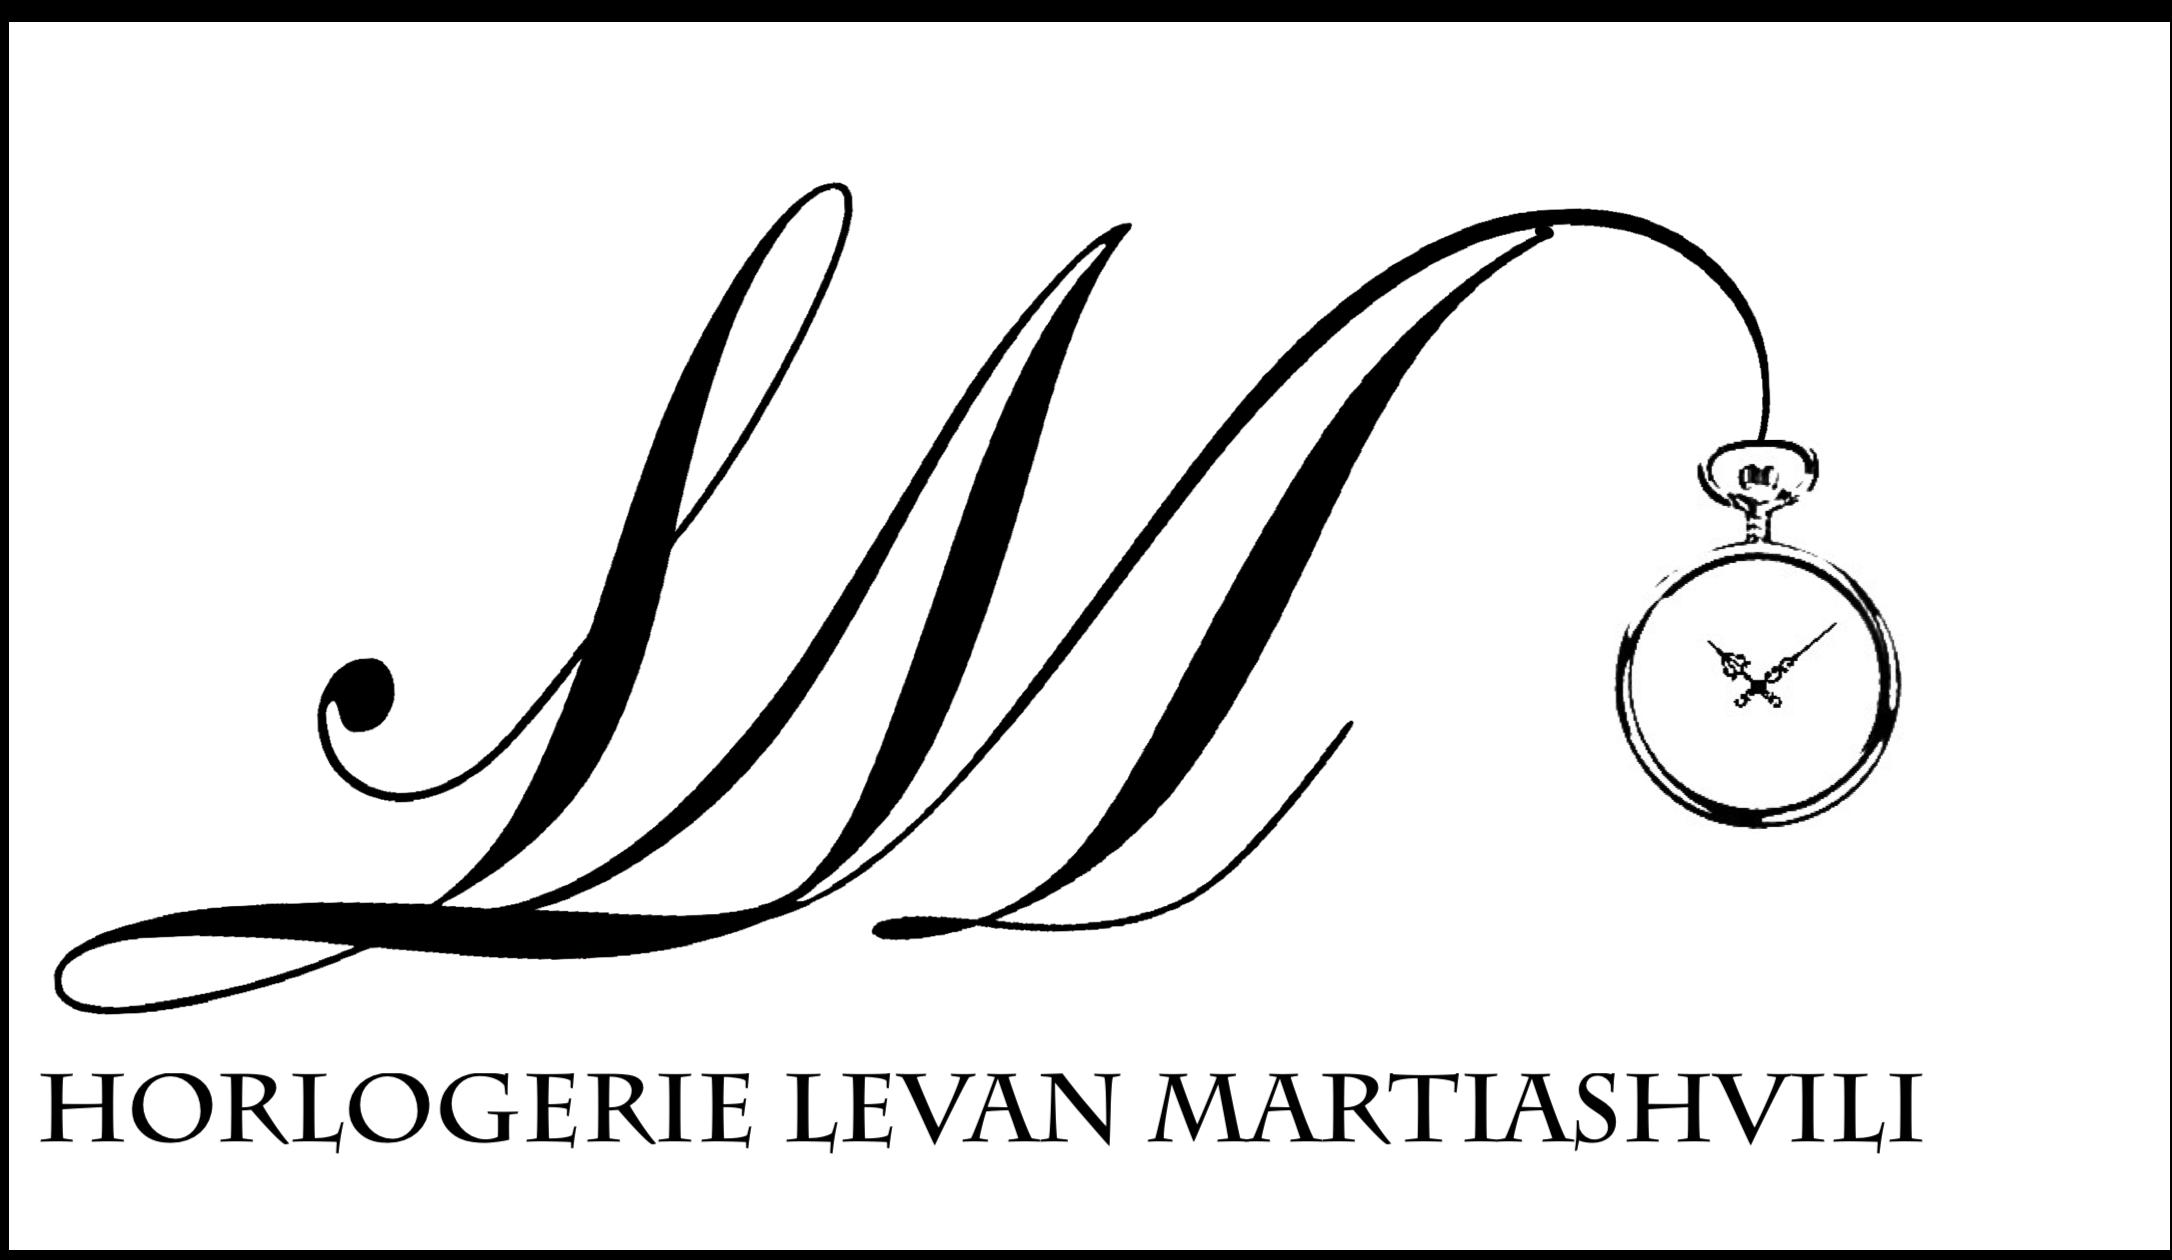 Horlogerie Levan Martiashvili